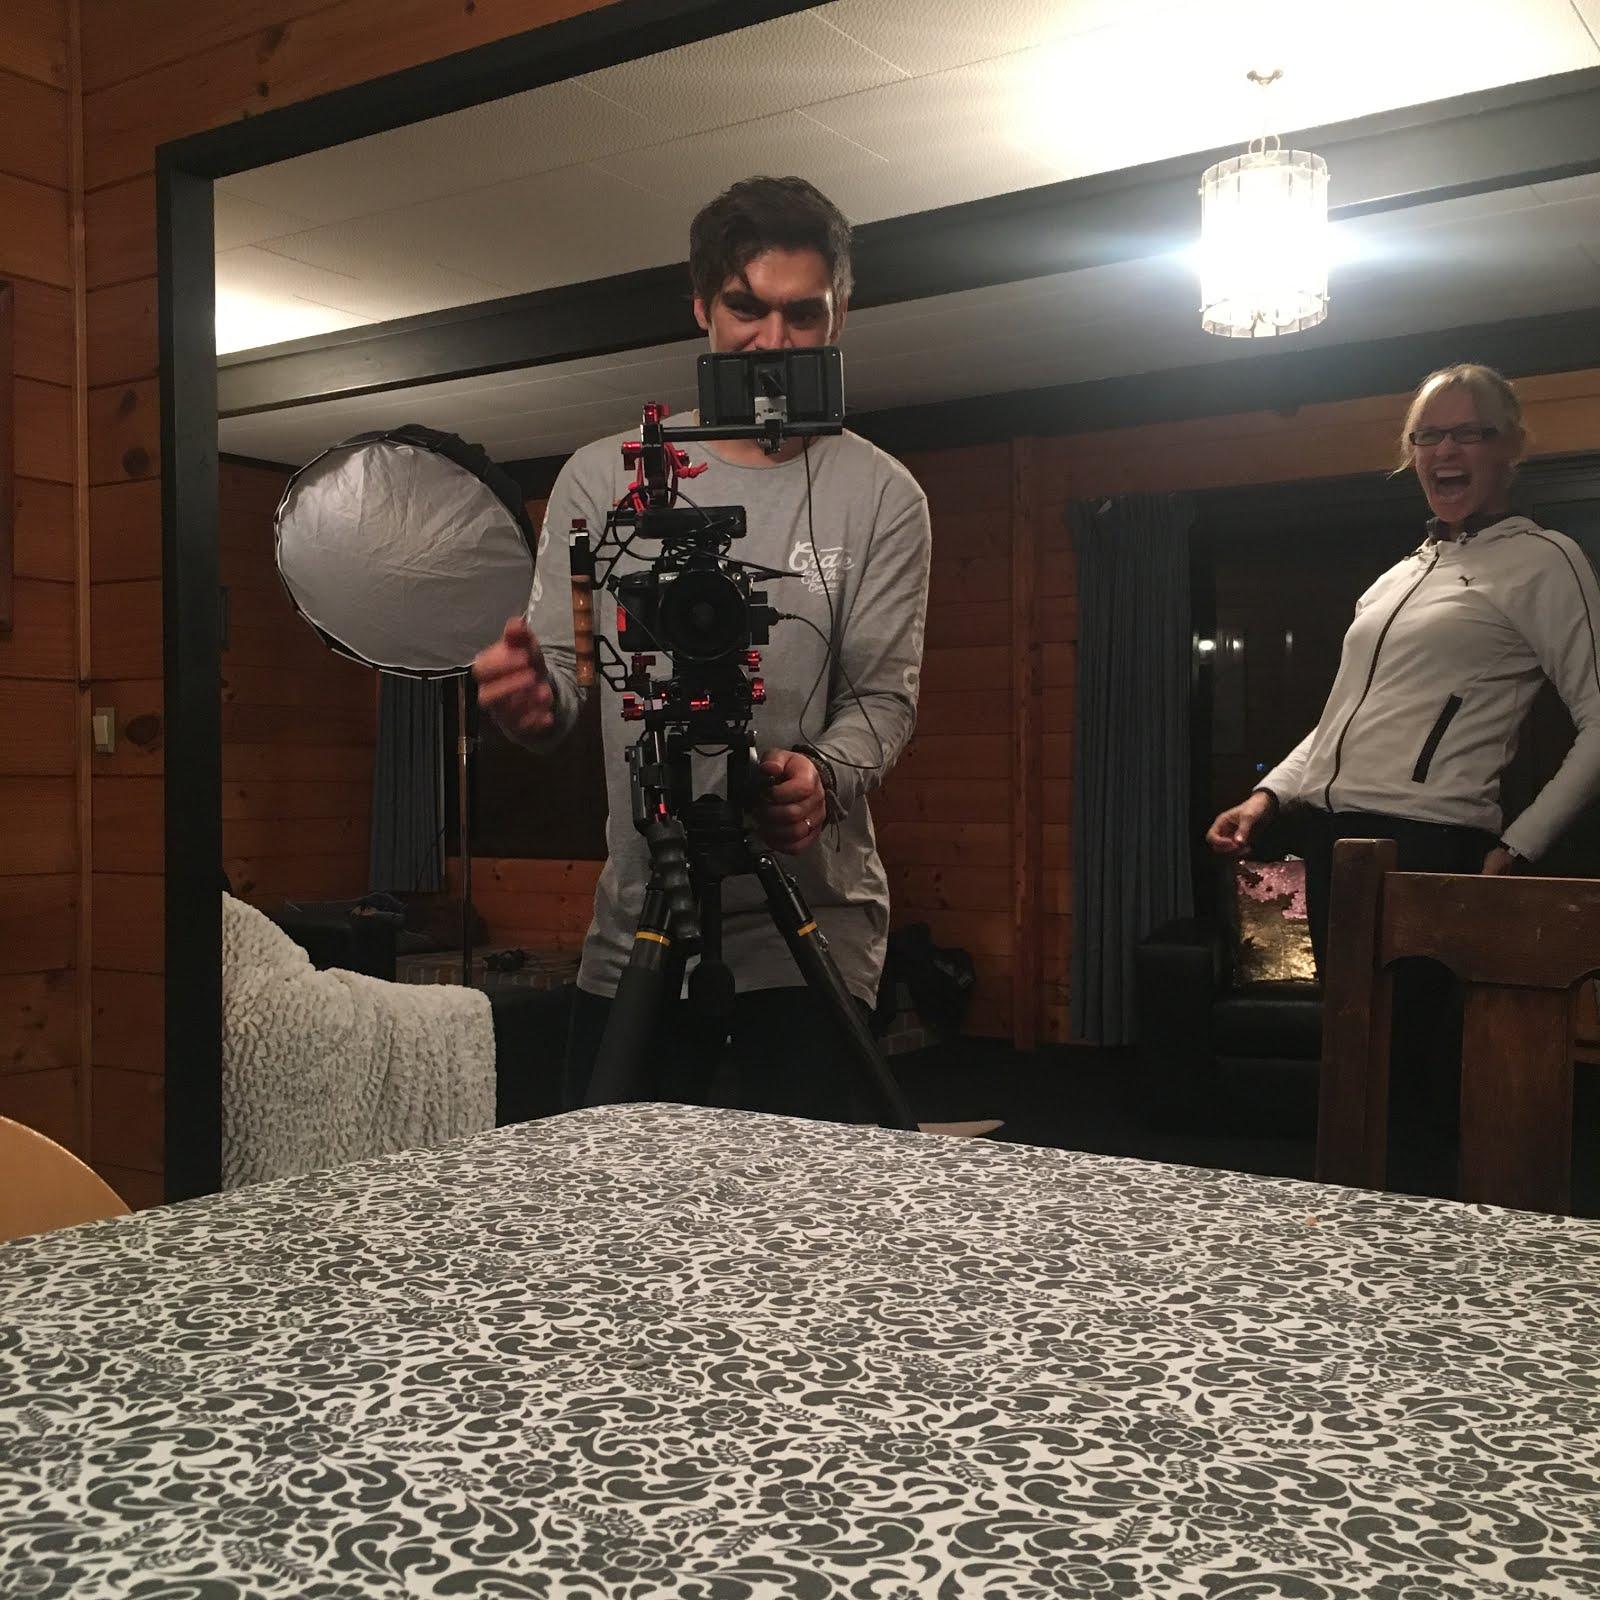 Neuseeland   New Zealand: Kamerateam im Haus   Film crew at home